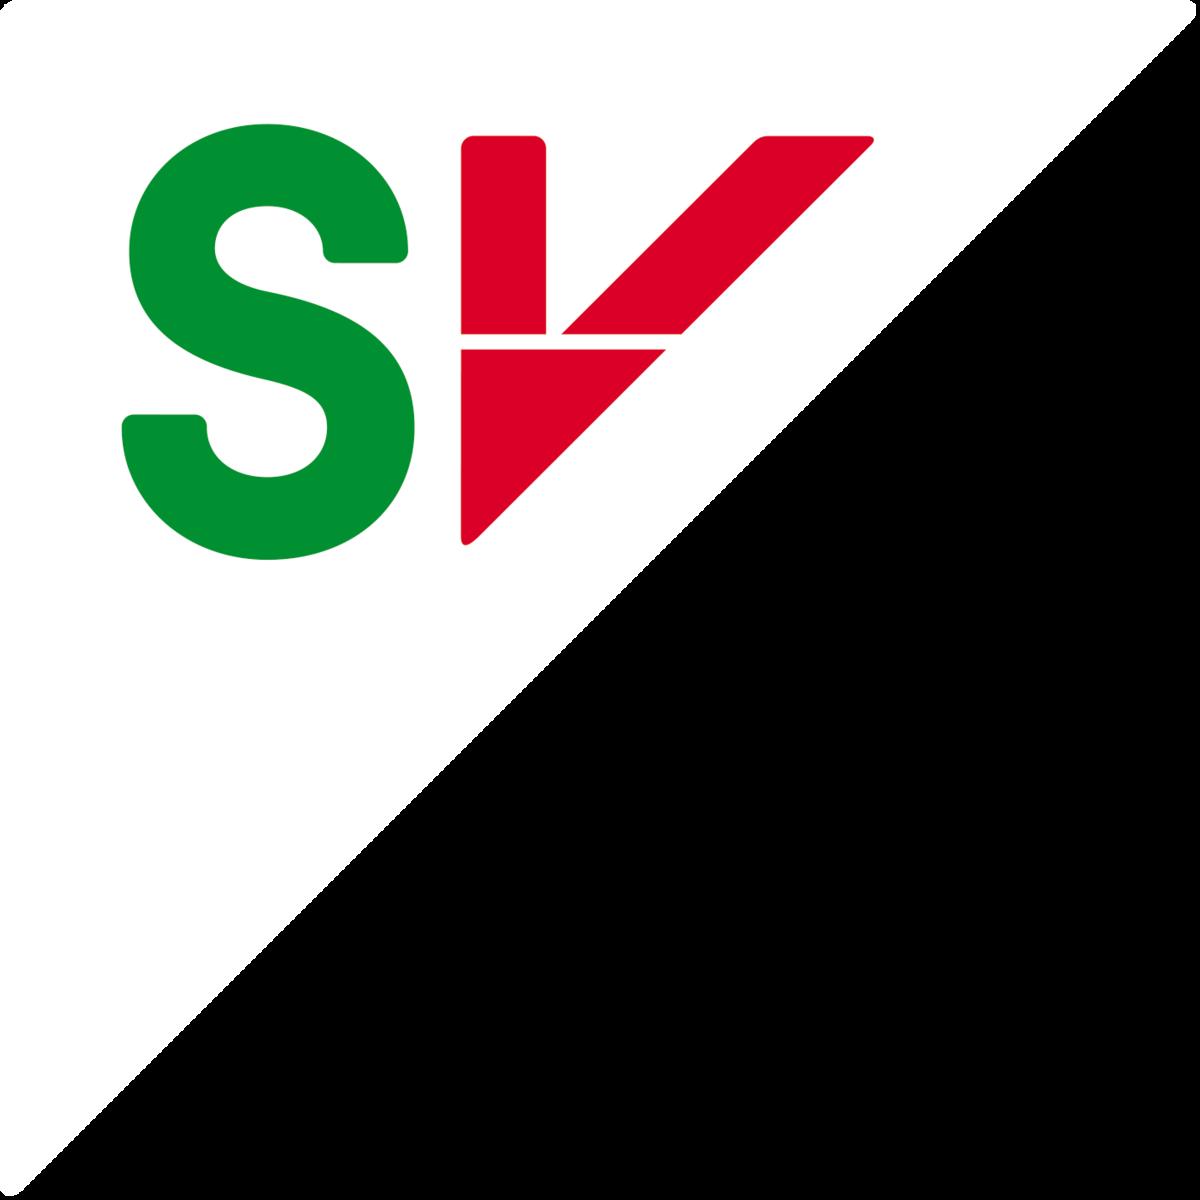 Standard sv